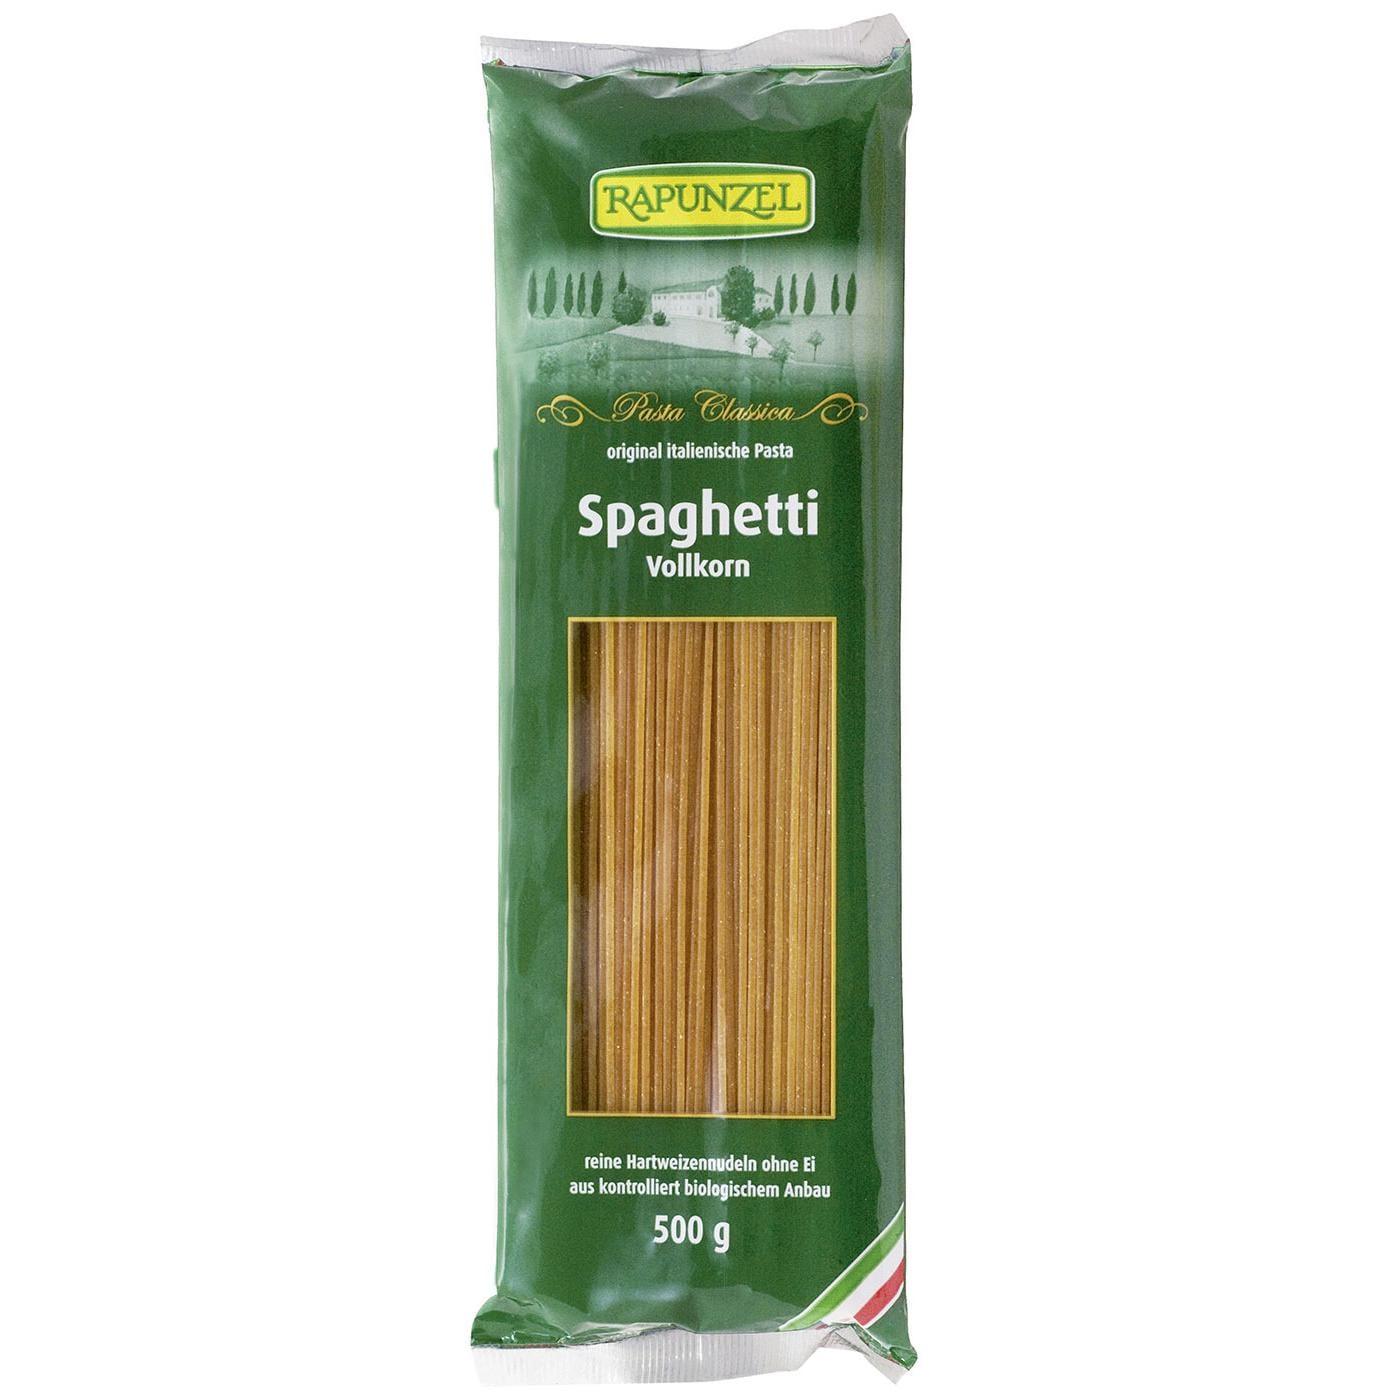 Rapunzel Bio Spaghetti Vollkorn 500g